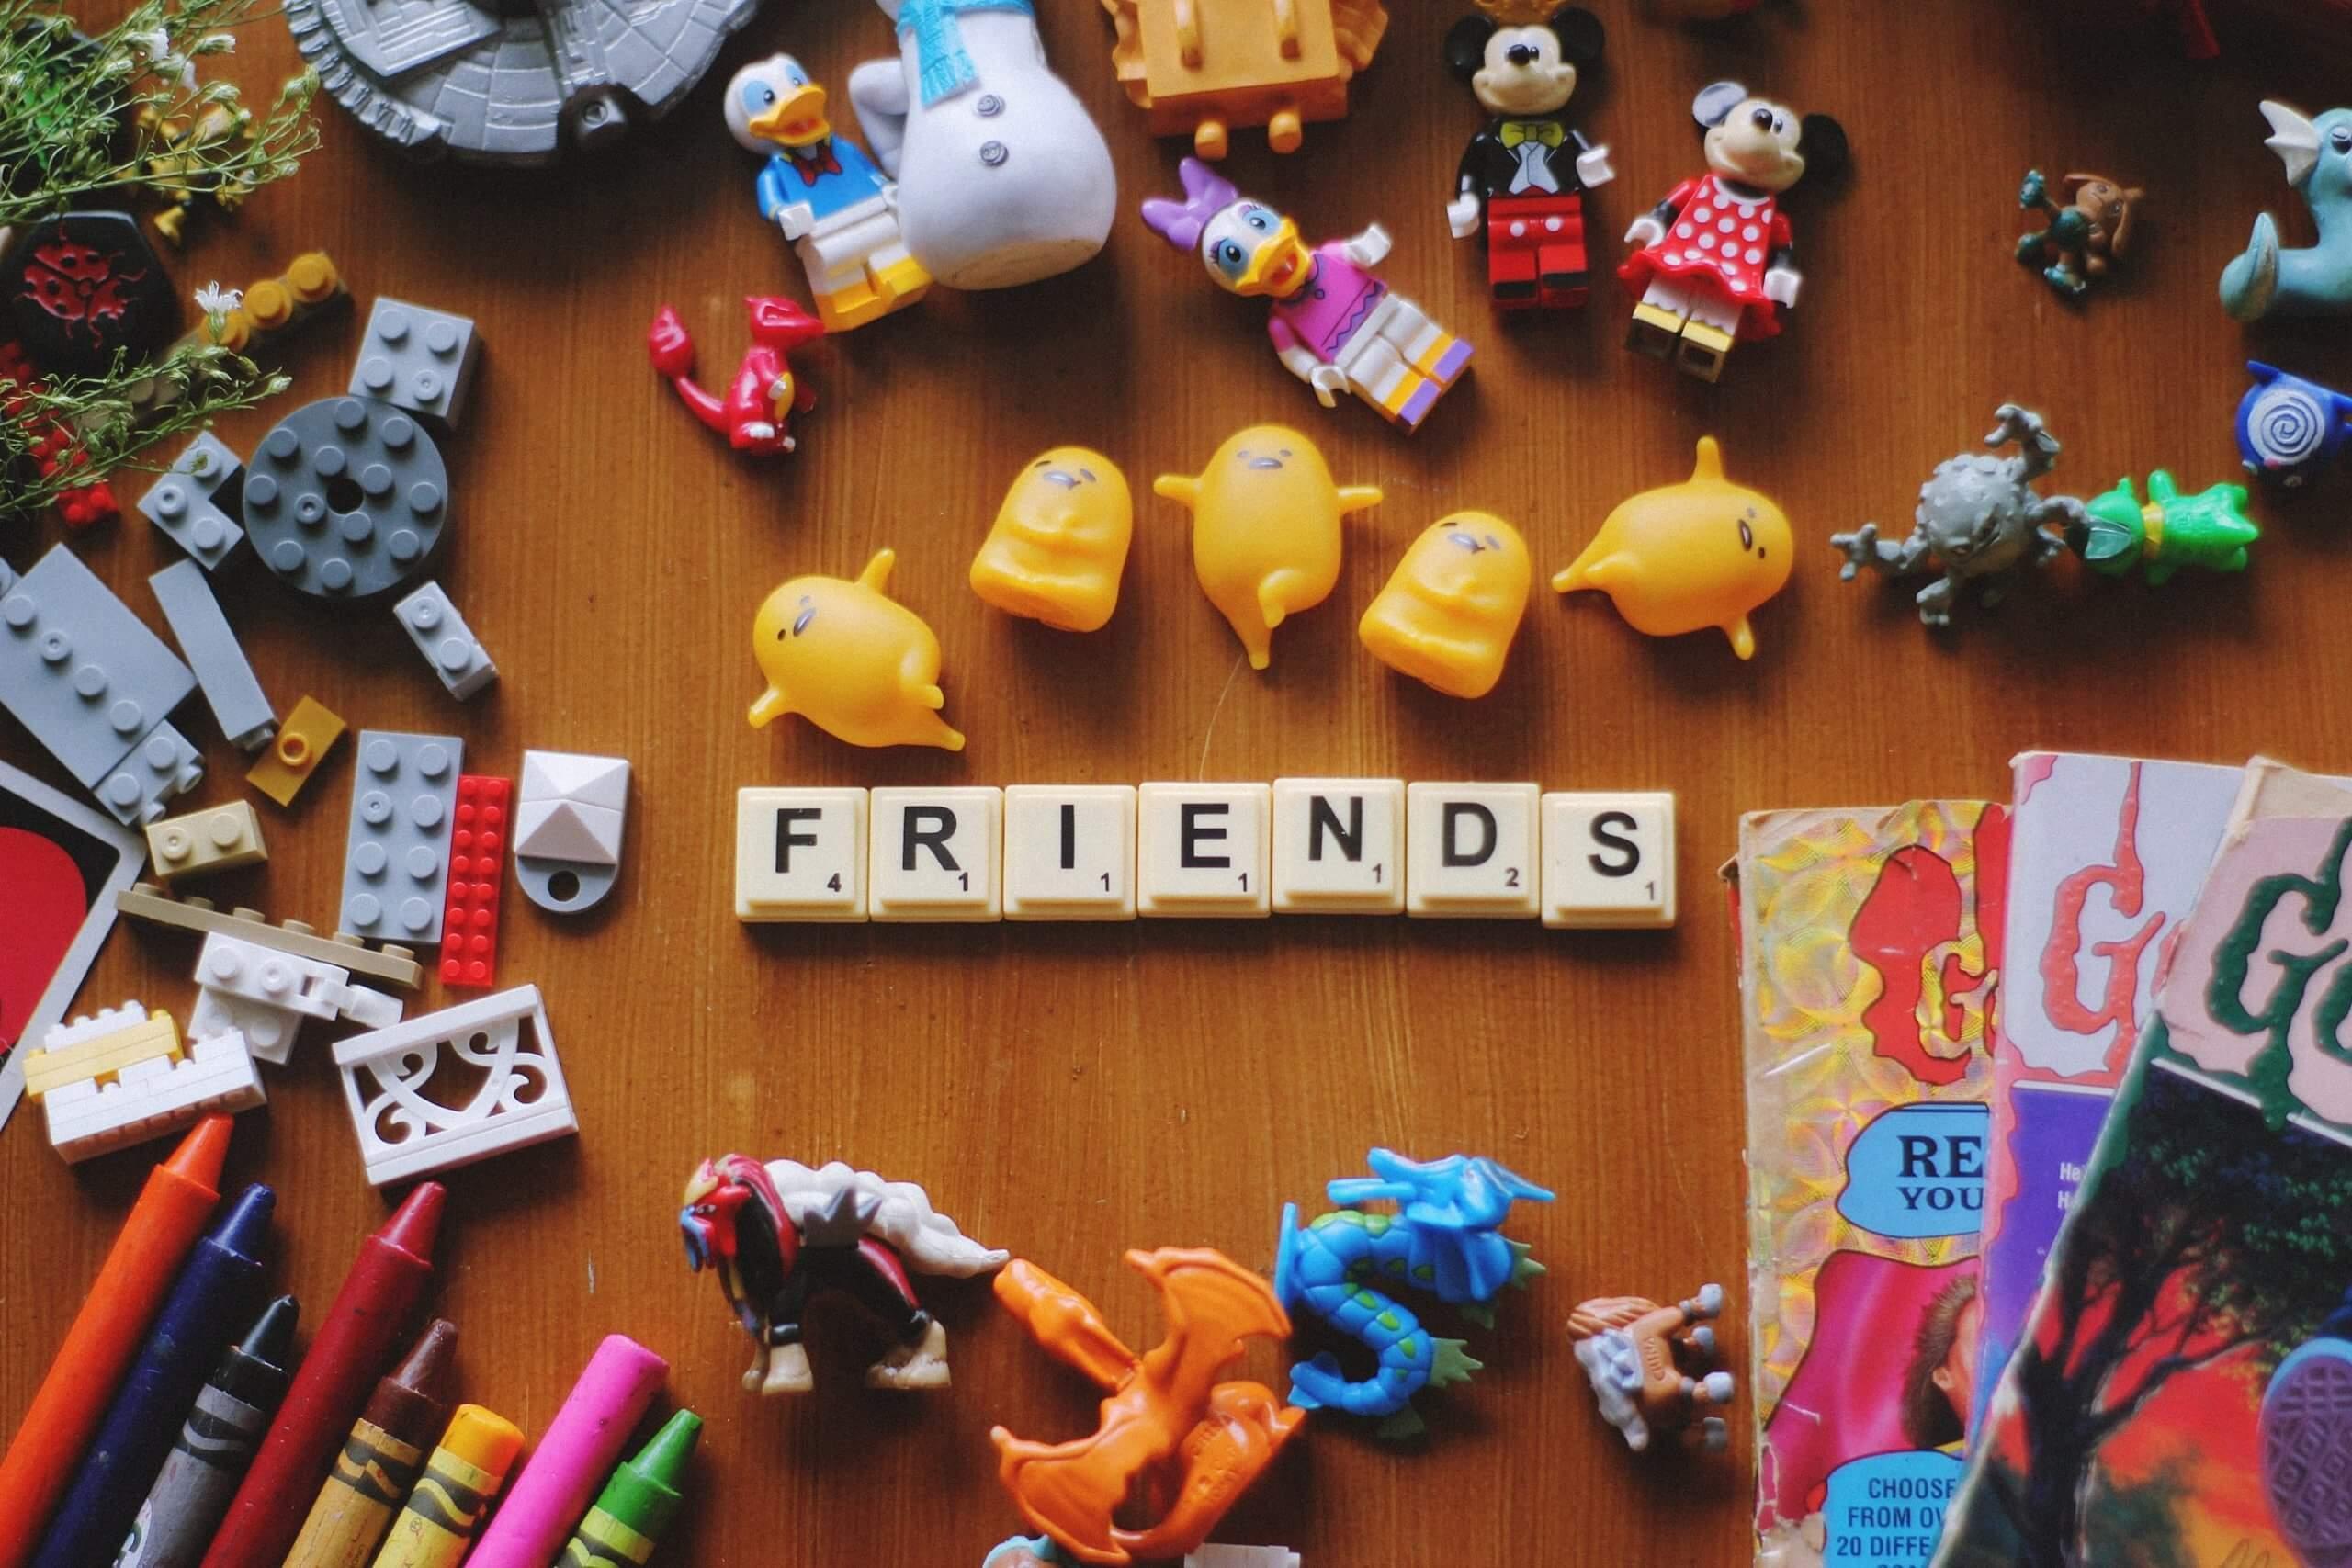 Friends Scrabble | The Mustcard